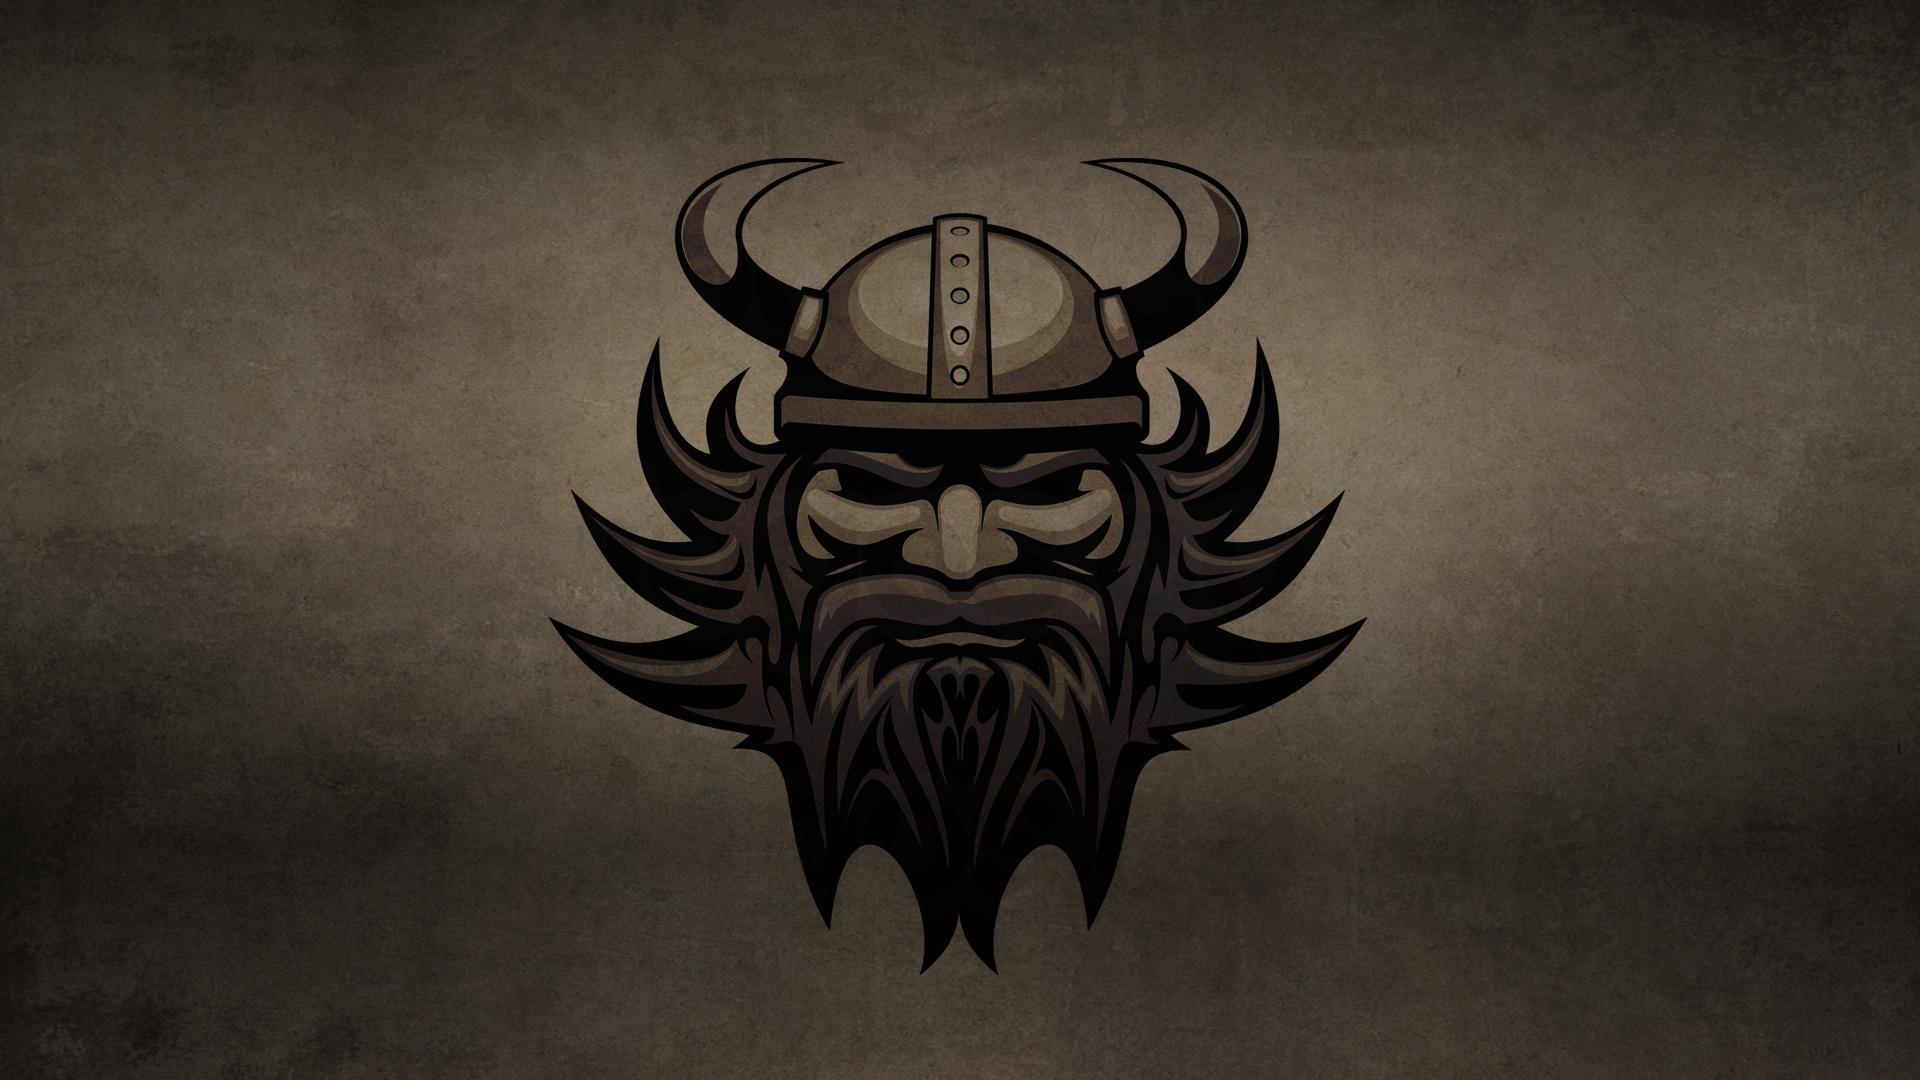 Res: 1920x1080, vikings hd wallpaper #501384